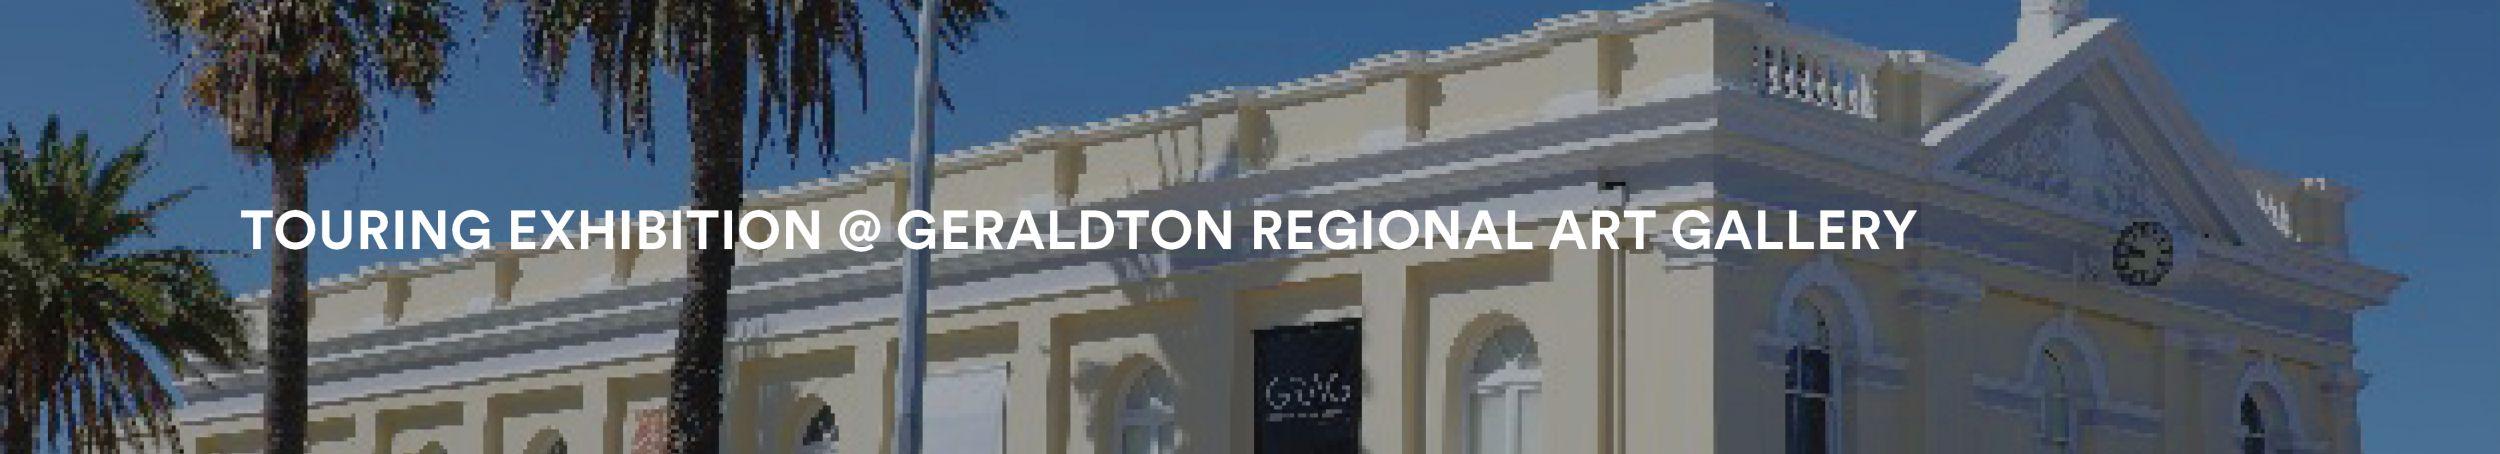 Touring Exhibition - 2020 Main Awards Finalists   Geraldton Regional Art Gallery